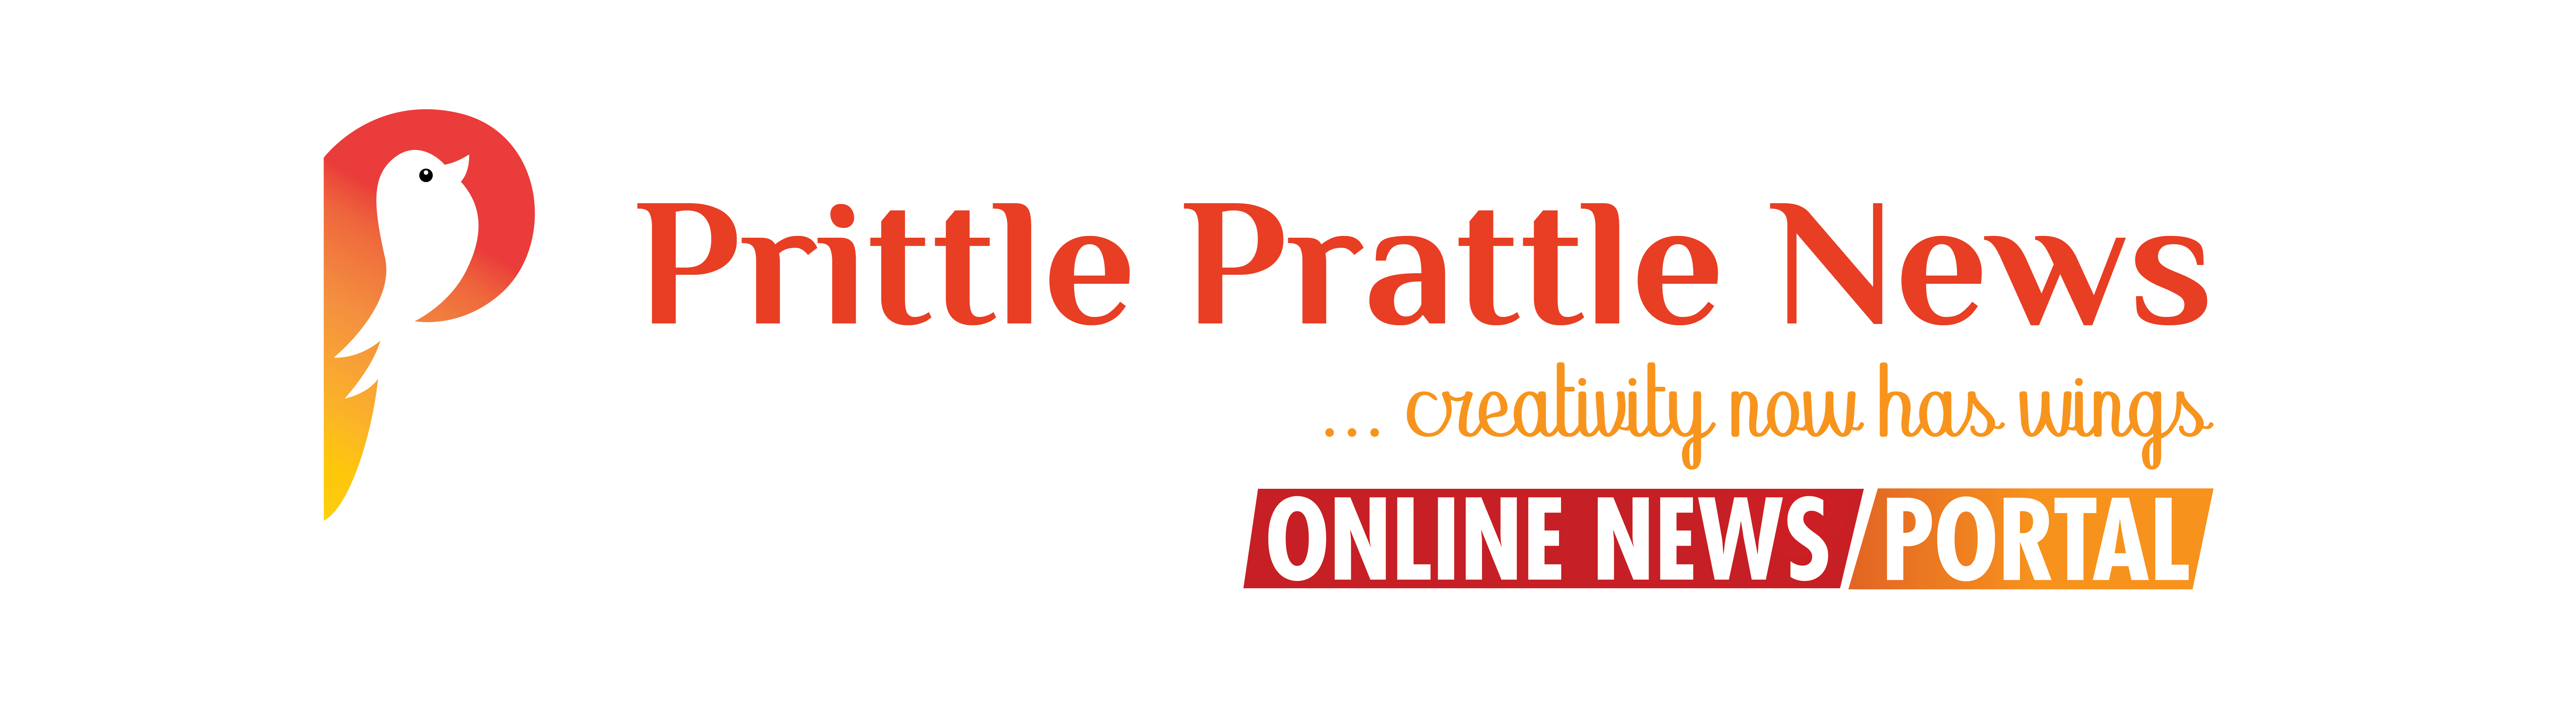 Prittle Prattle News